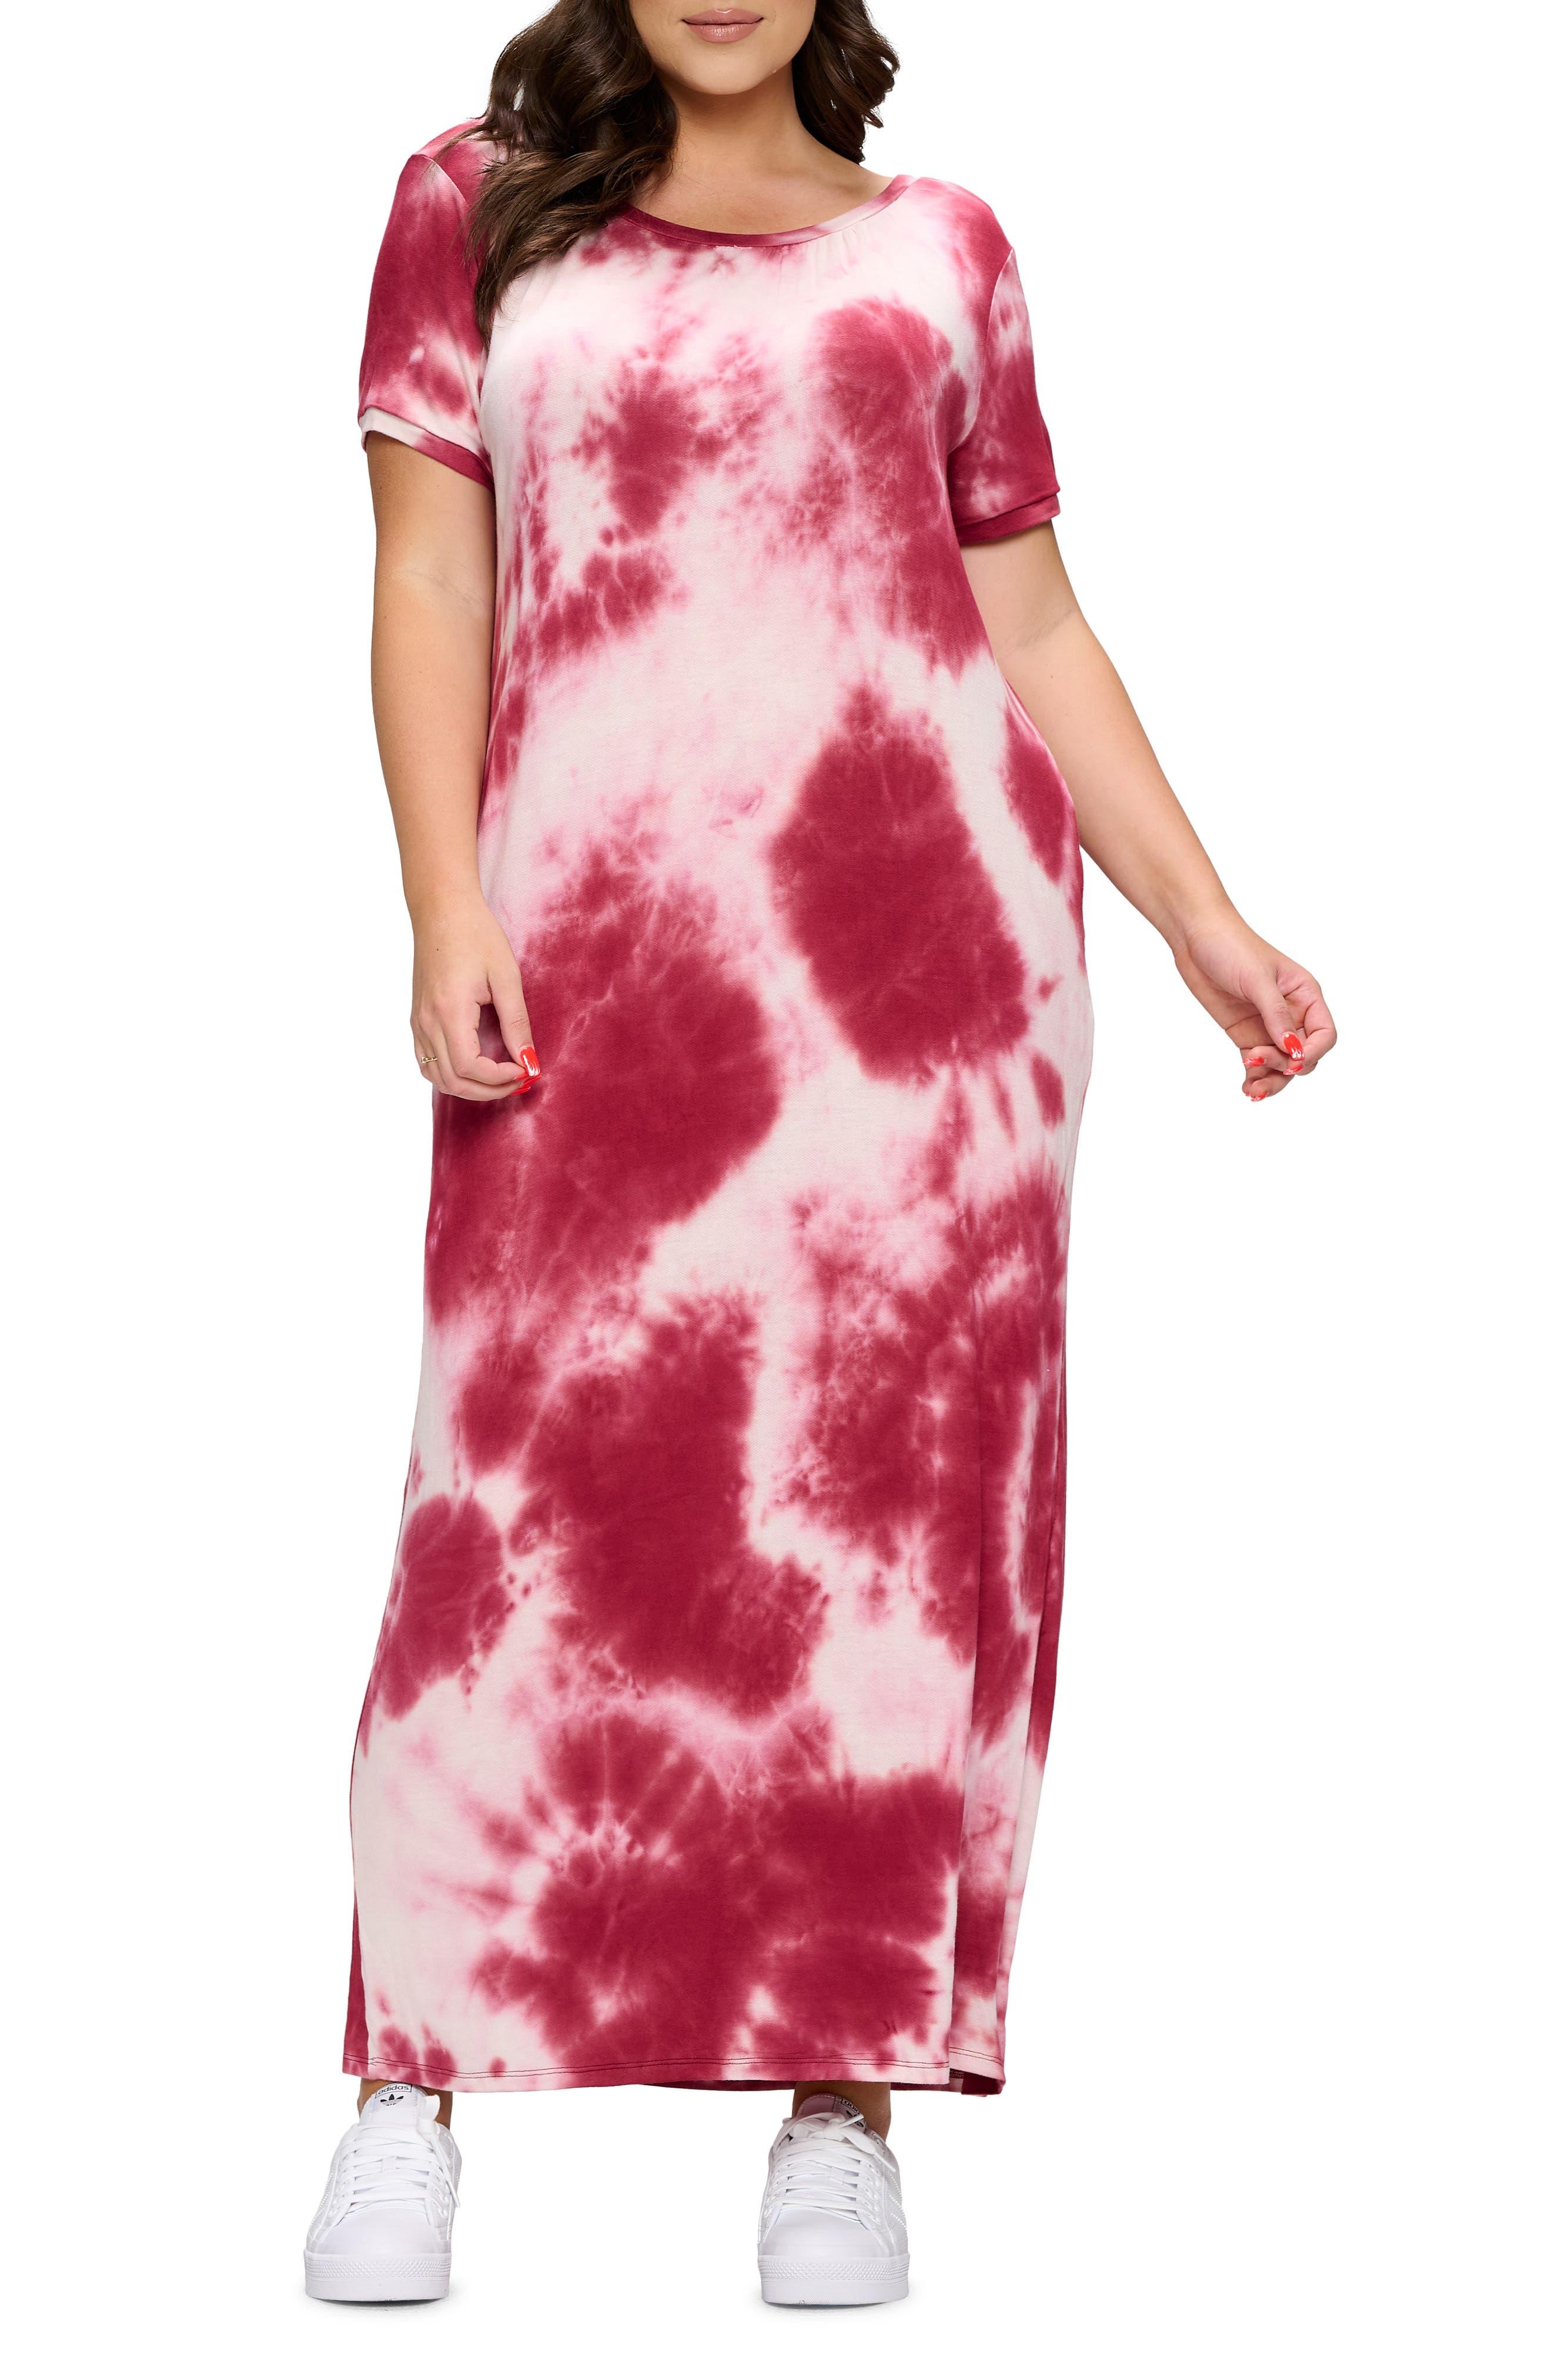 Ruched Tie Dye T-Shirt Dress